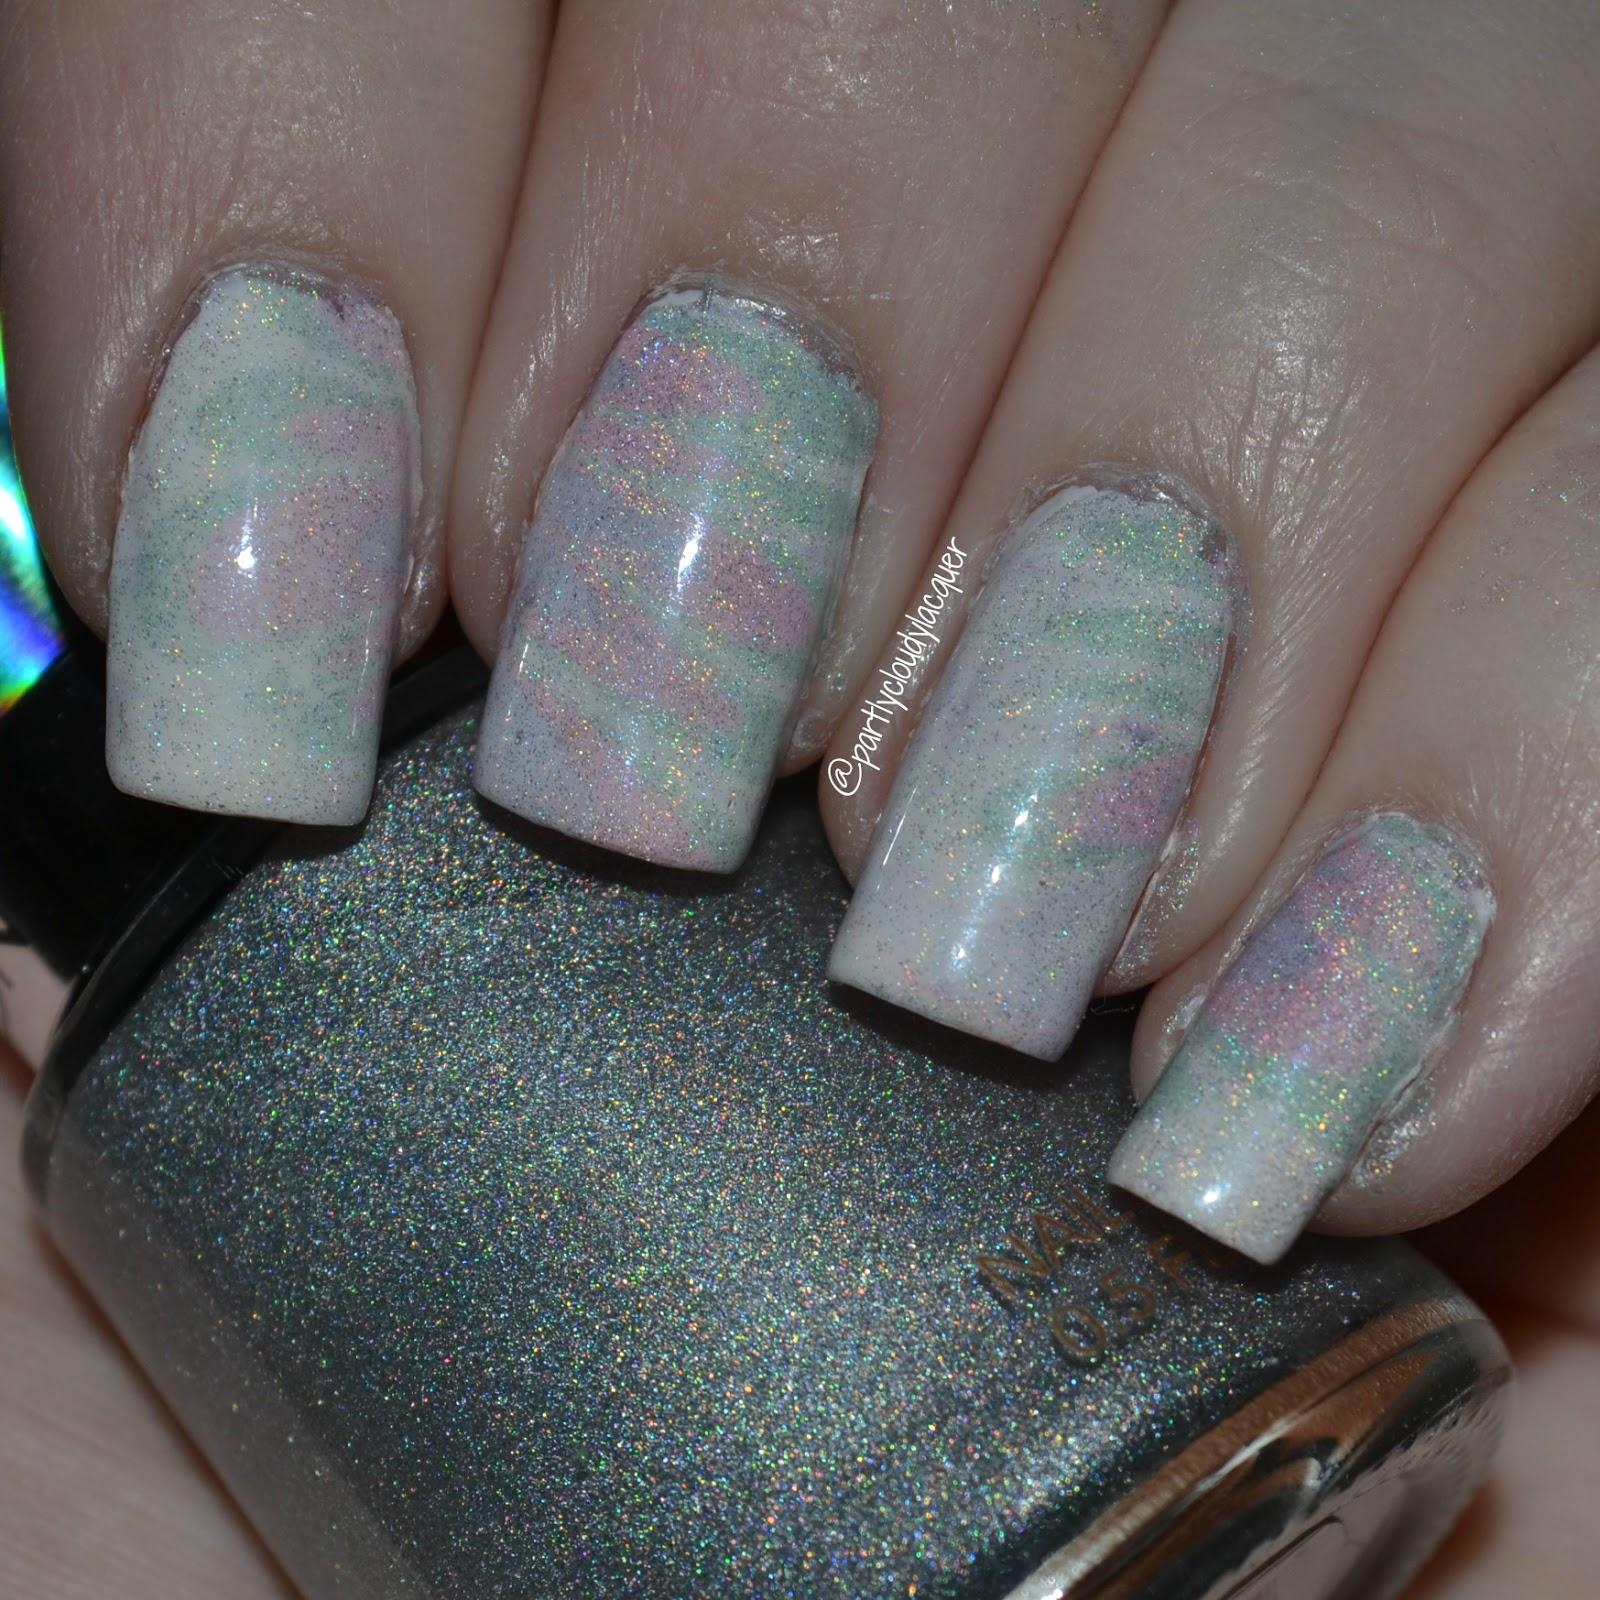 Pastel Holographic Watermarble - Revlon HoloChrome Polishes | Partly ...